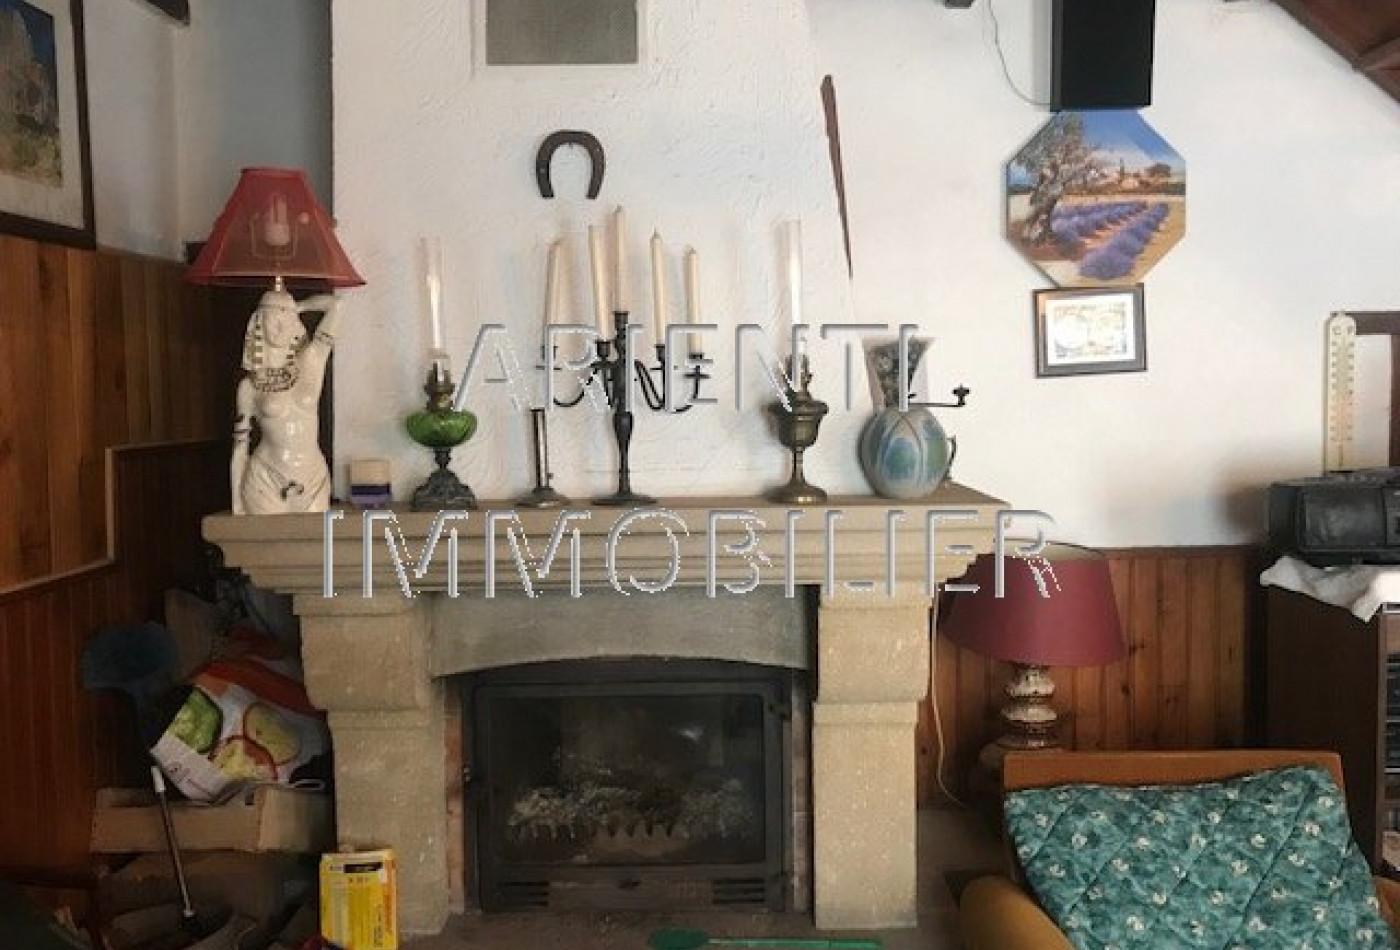 A vendre  Teyssieres | Réf 260013153 - Office immobilier arienti